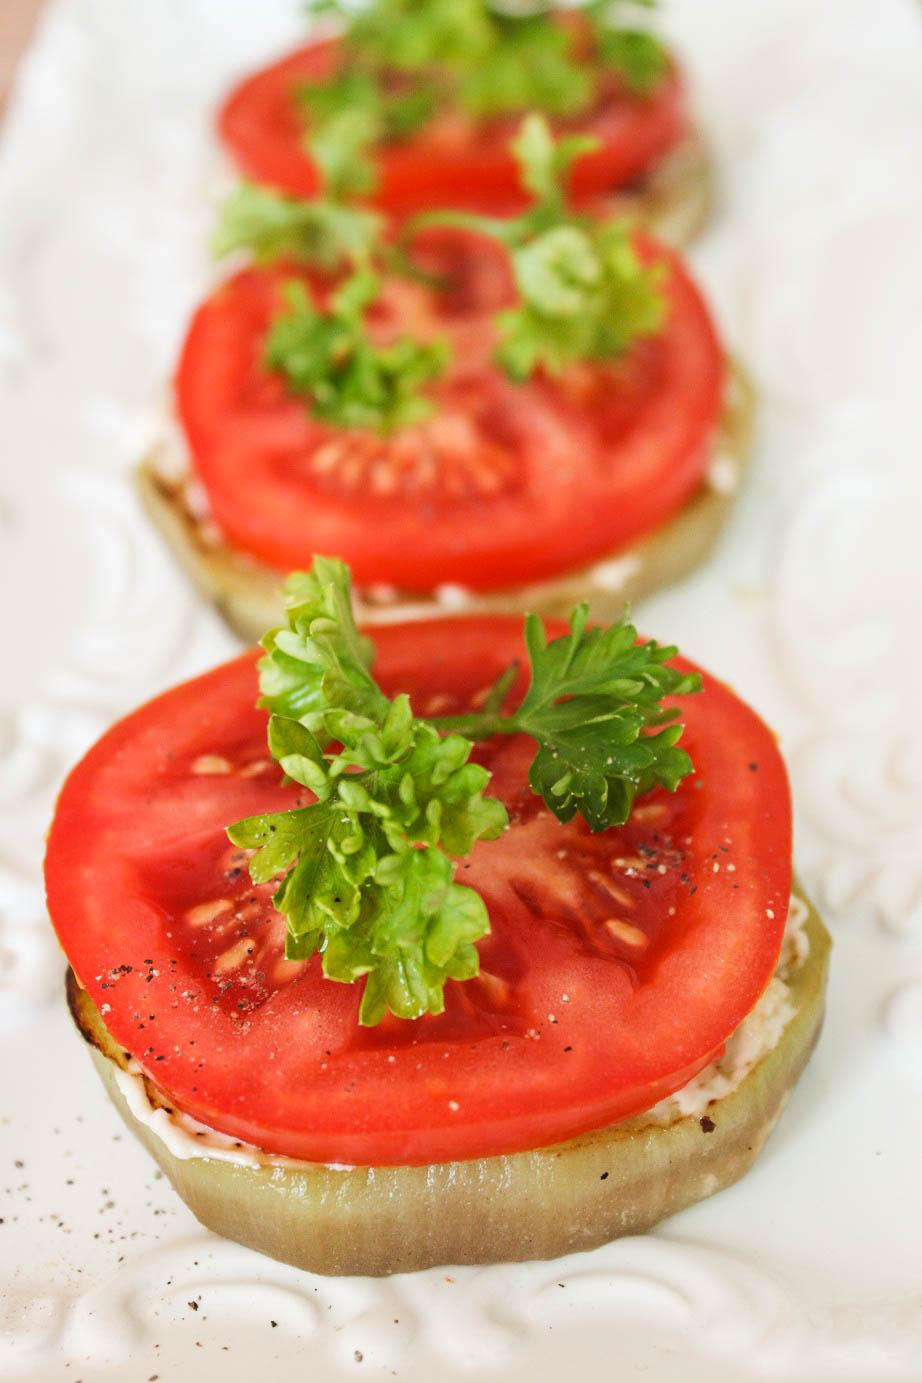 Piquant  Aubergine with Tomato and Garlic